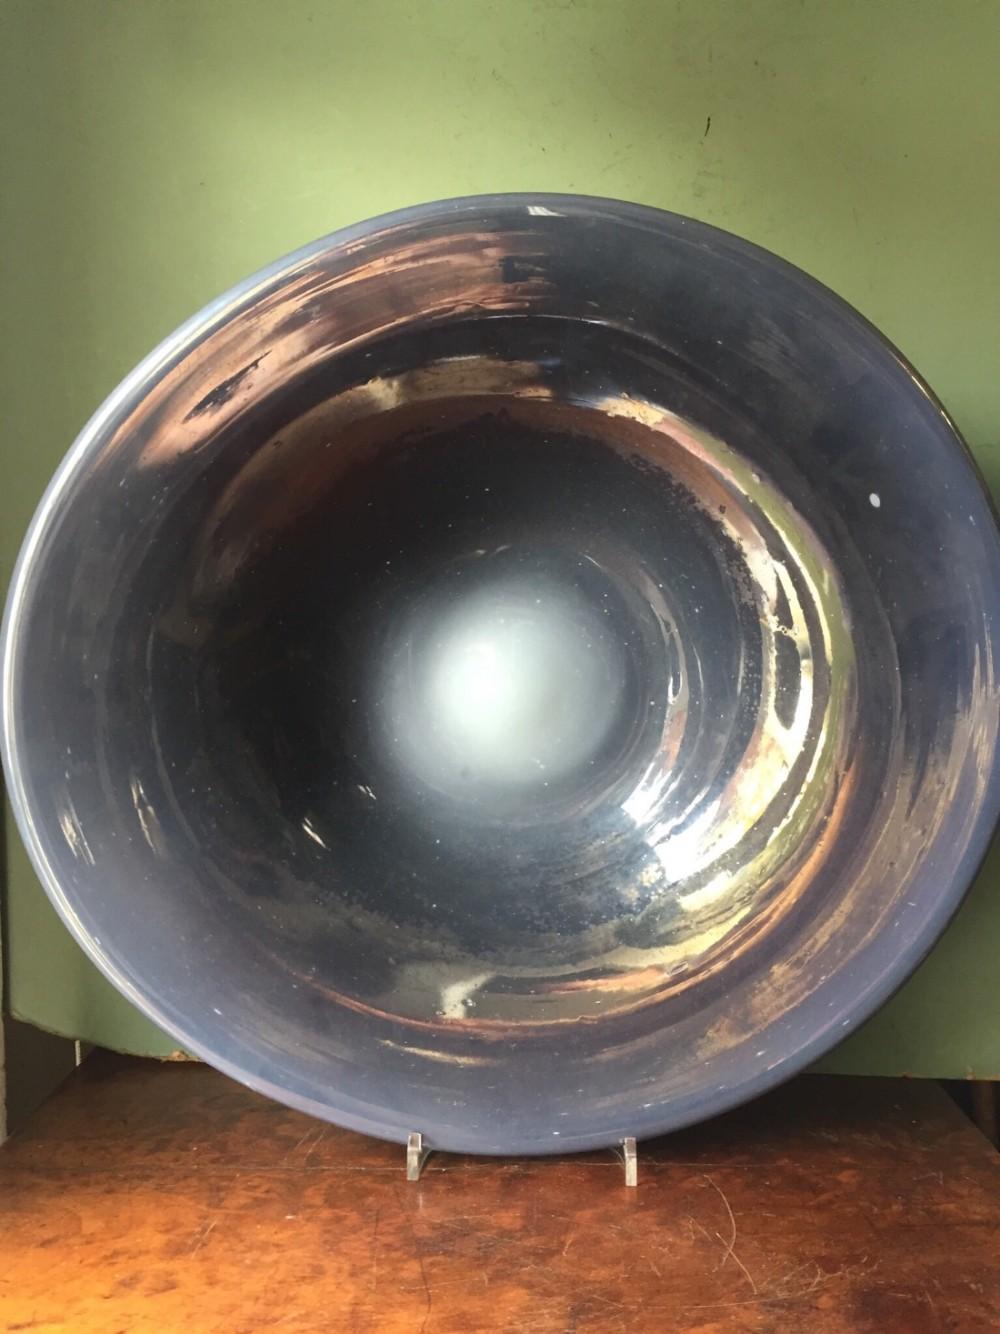 interesting late c19thearly c20th mercurygrey glass dish